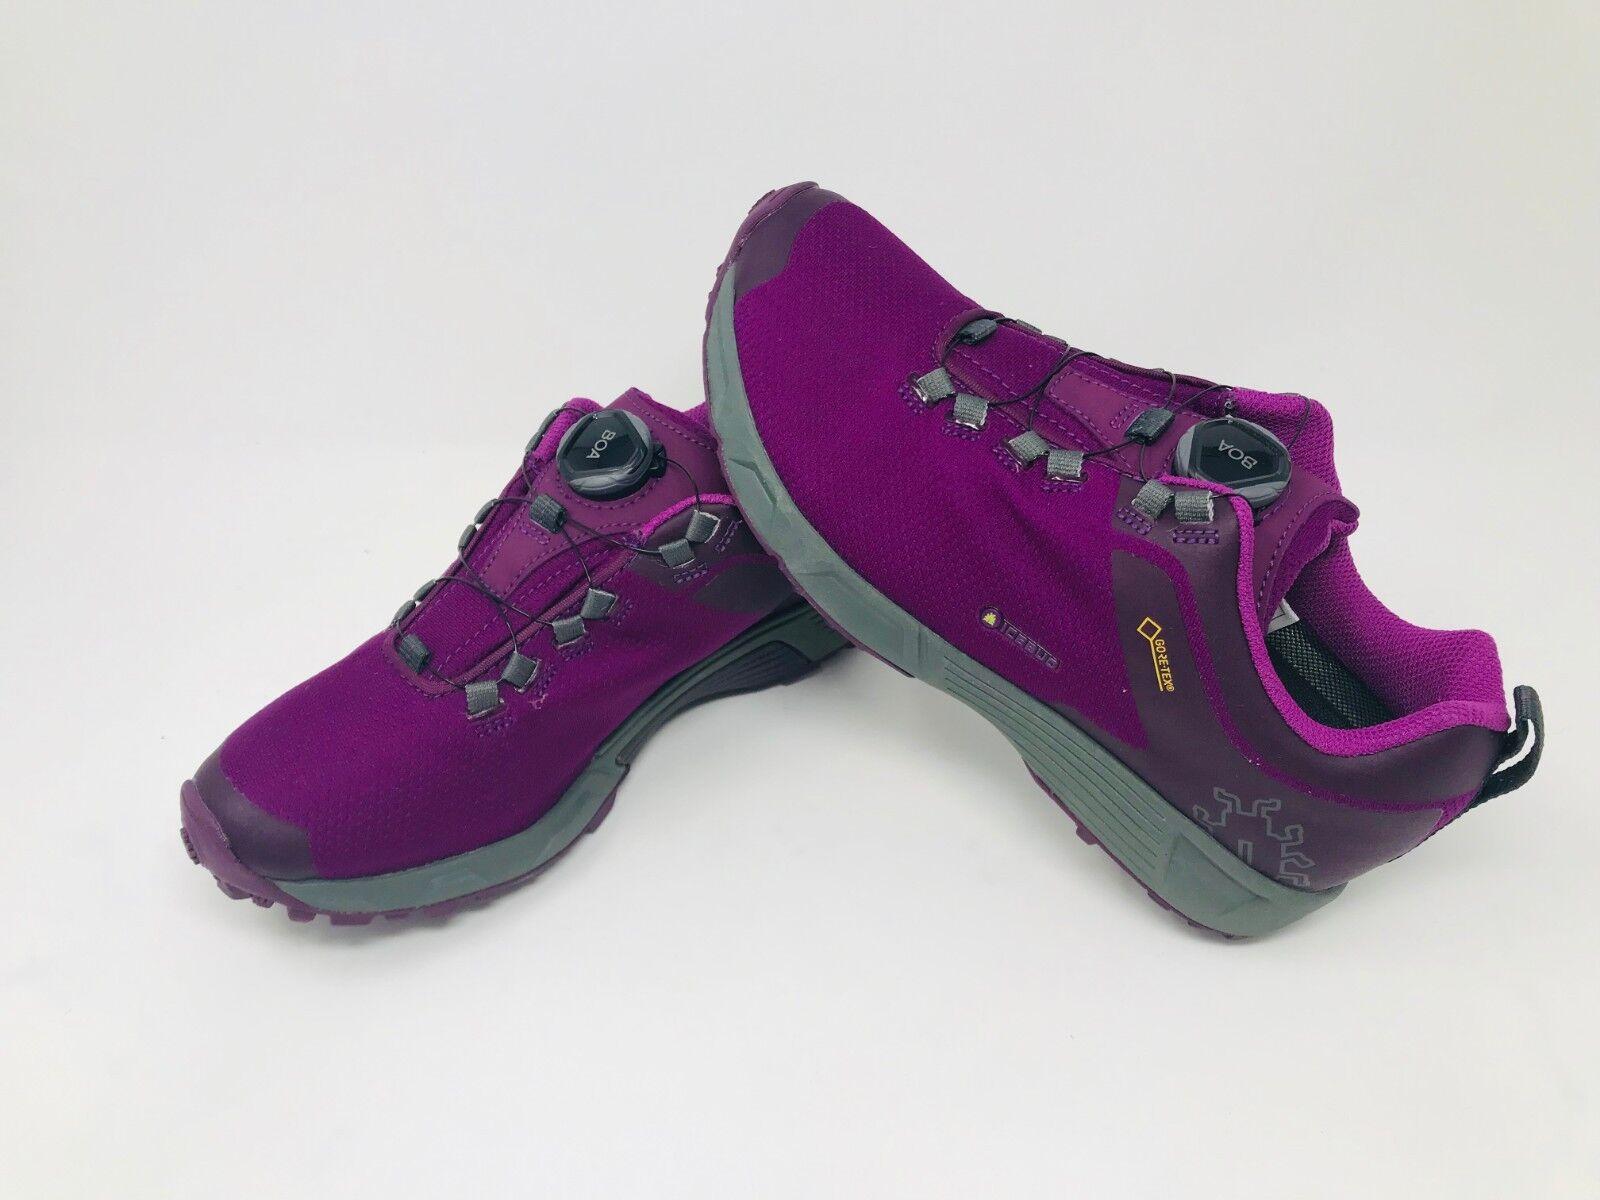 Women's Icebug DTS3 BUGrip GTX (purple)